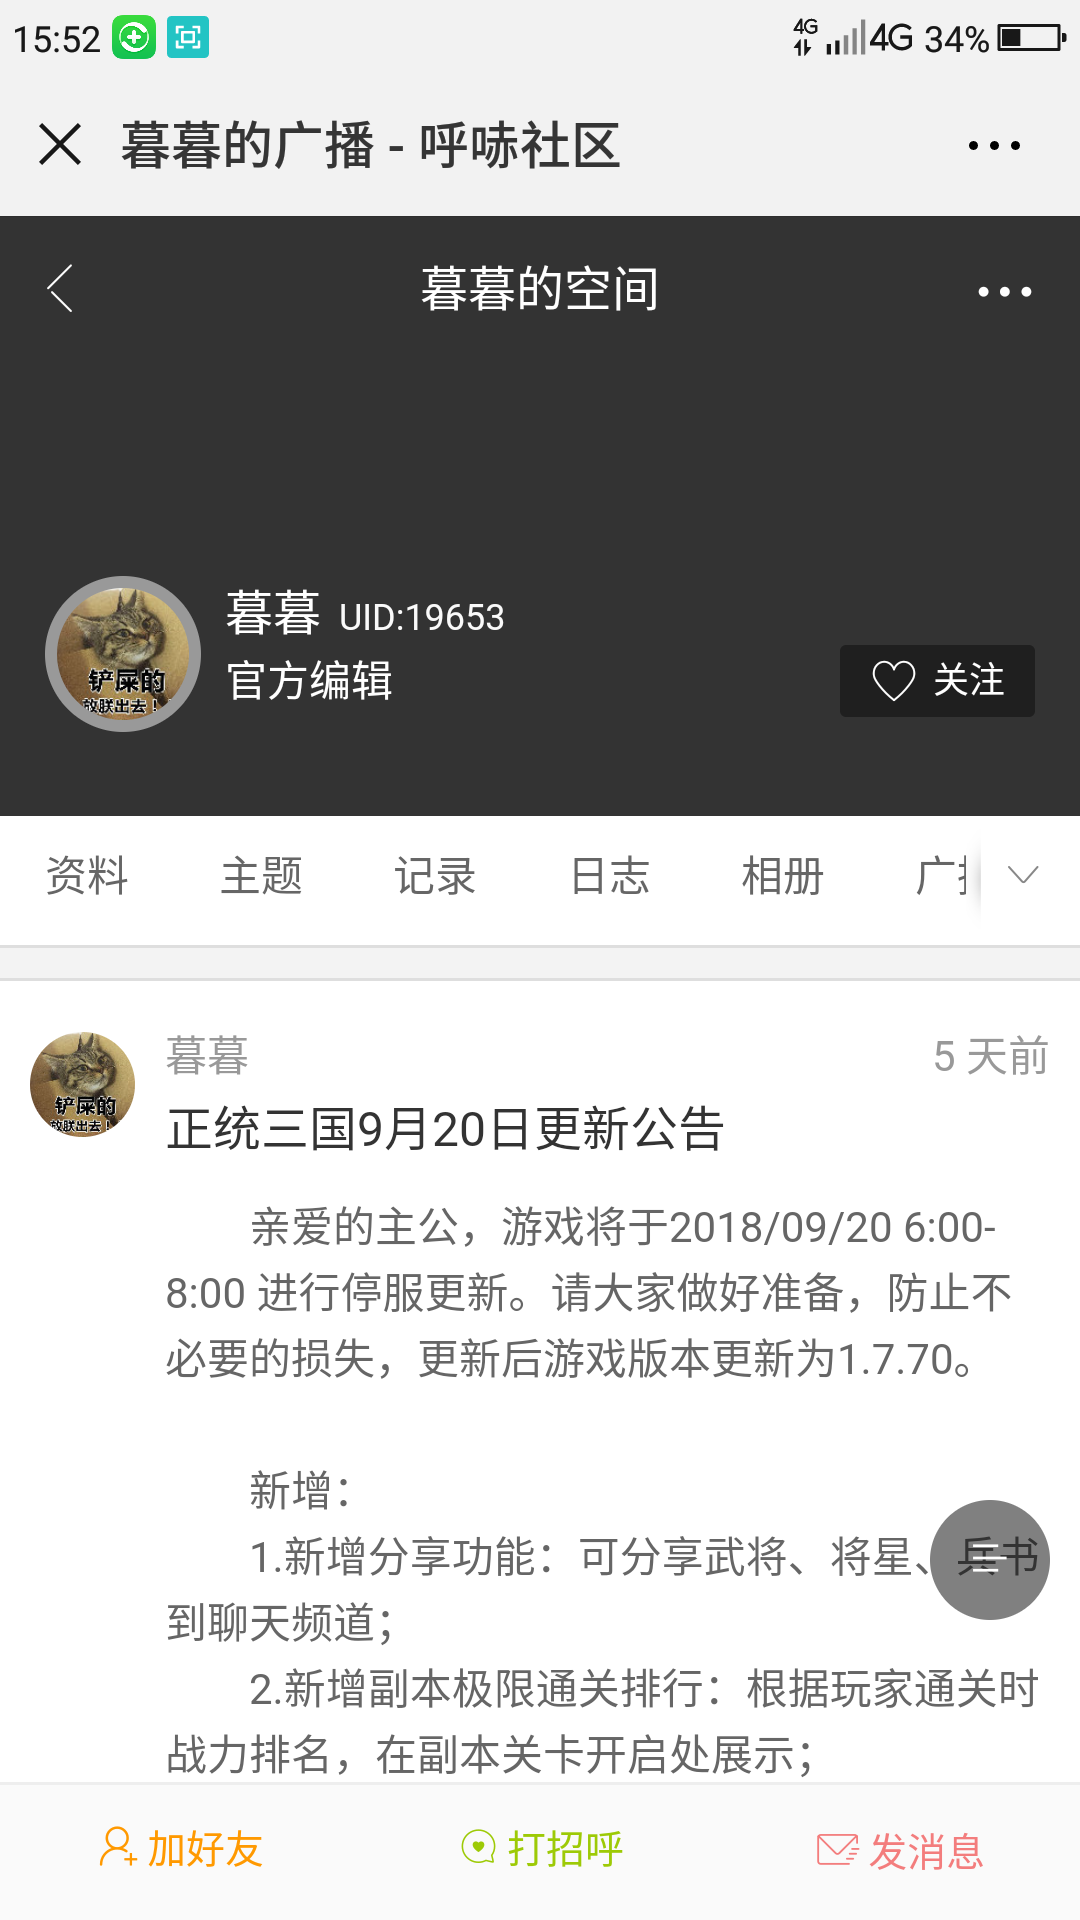 Screenshot_2018-09-19-15-52-23.png